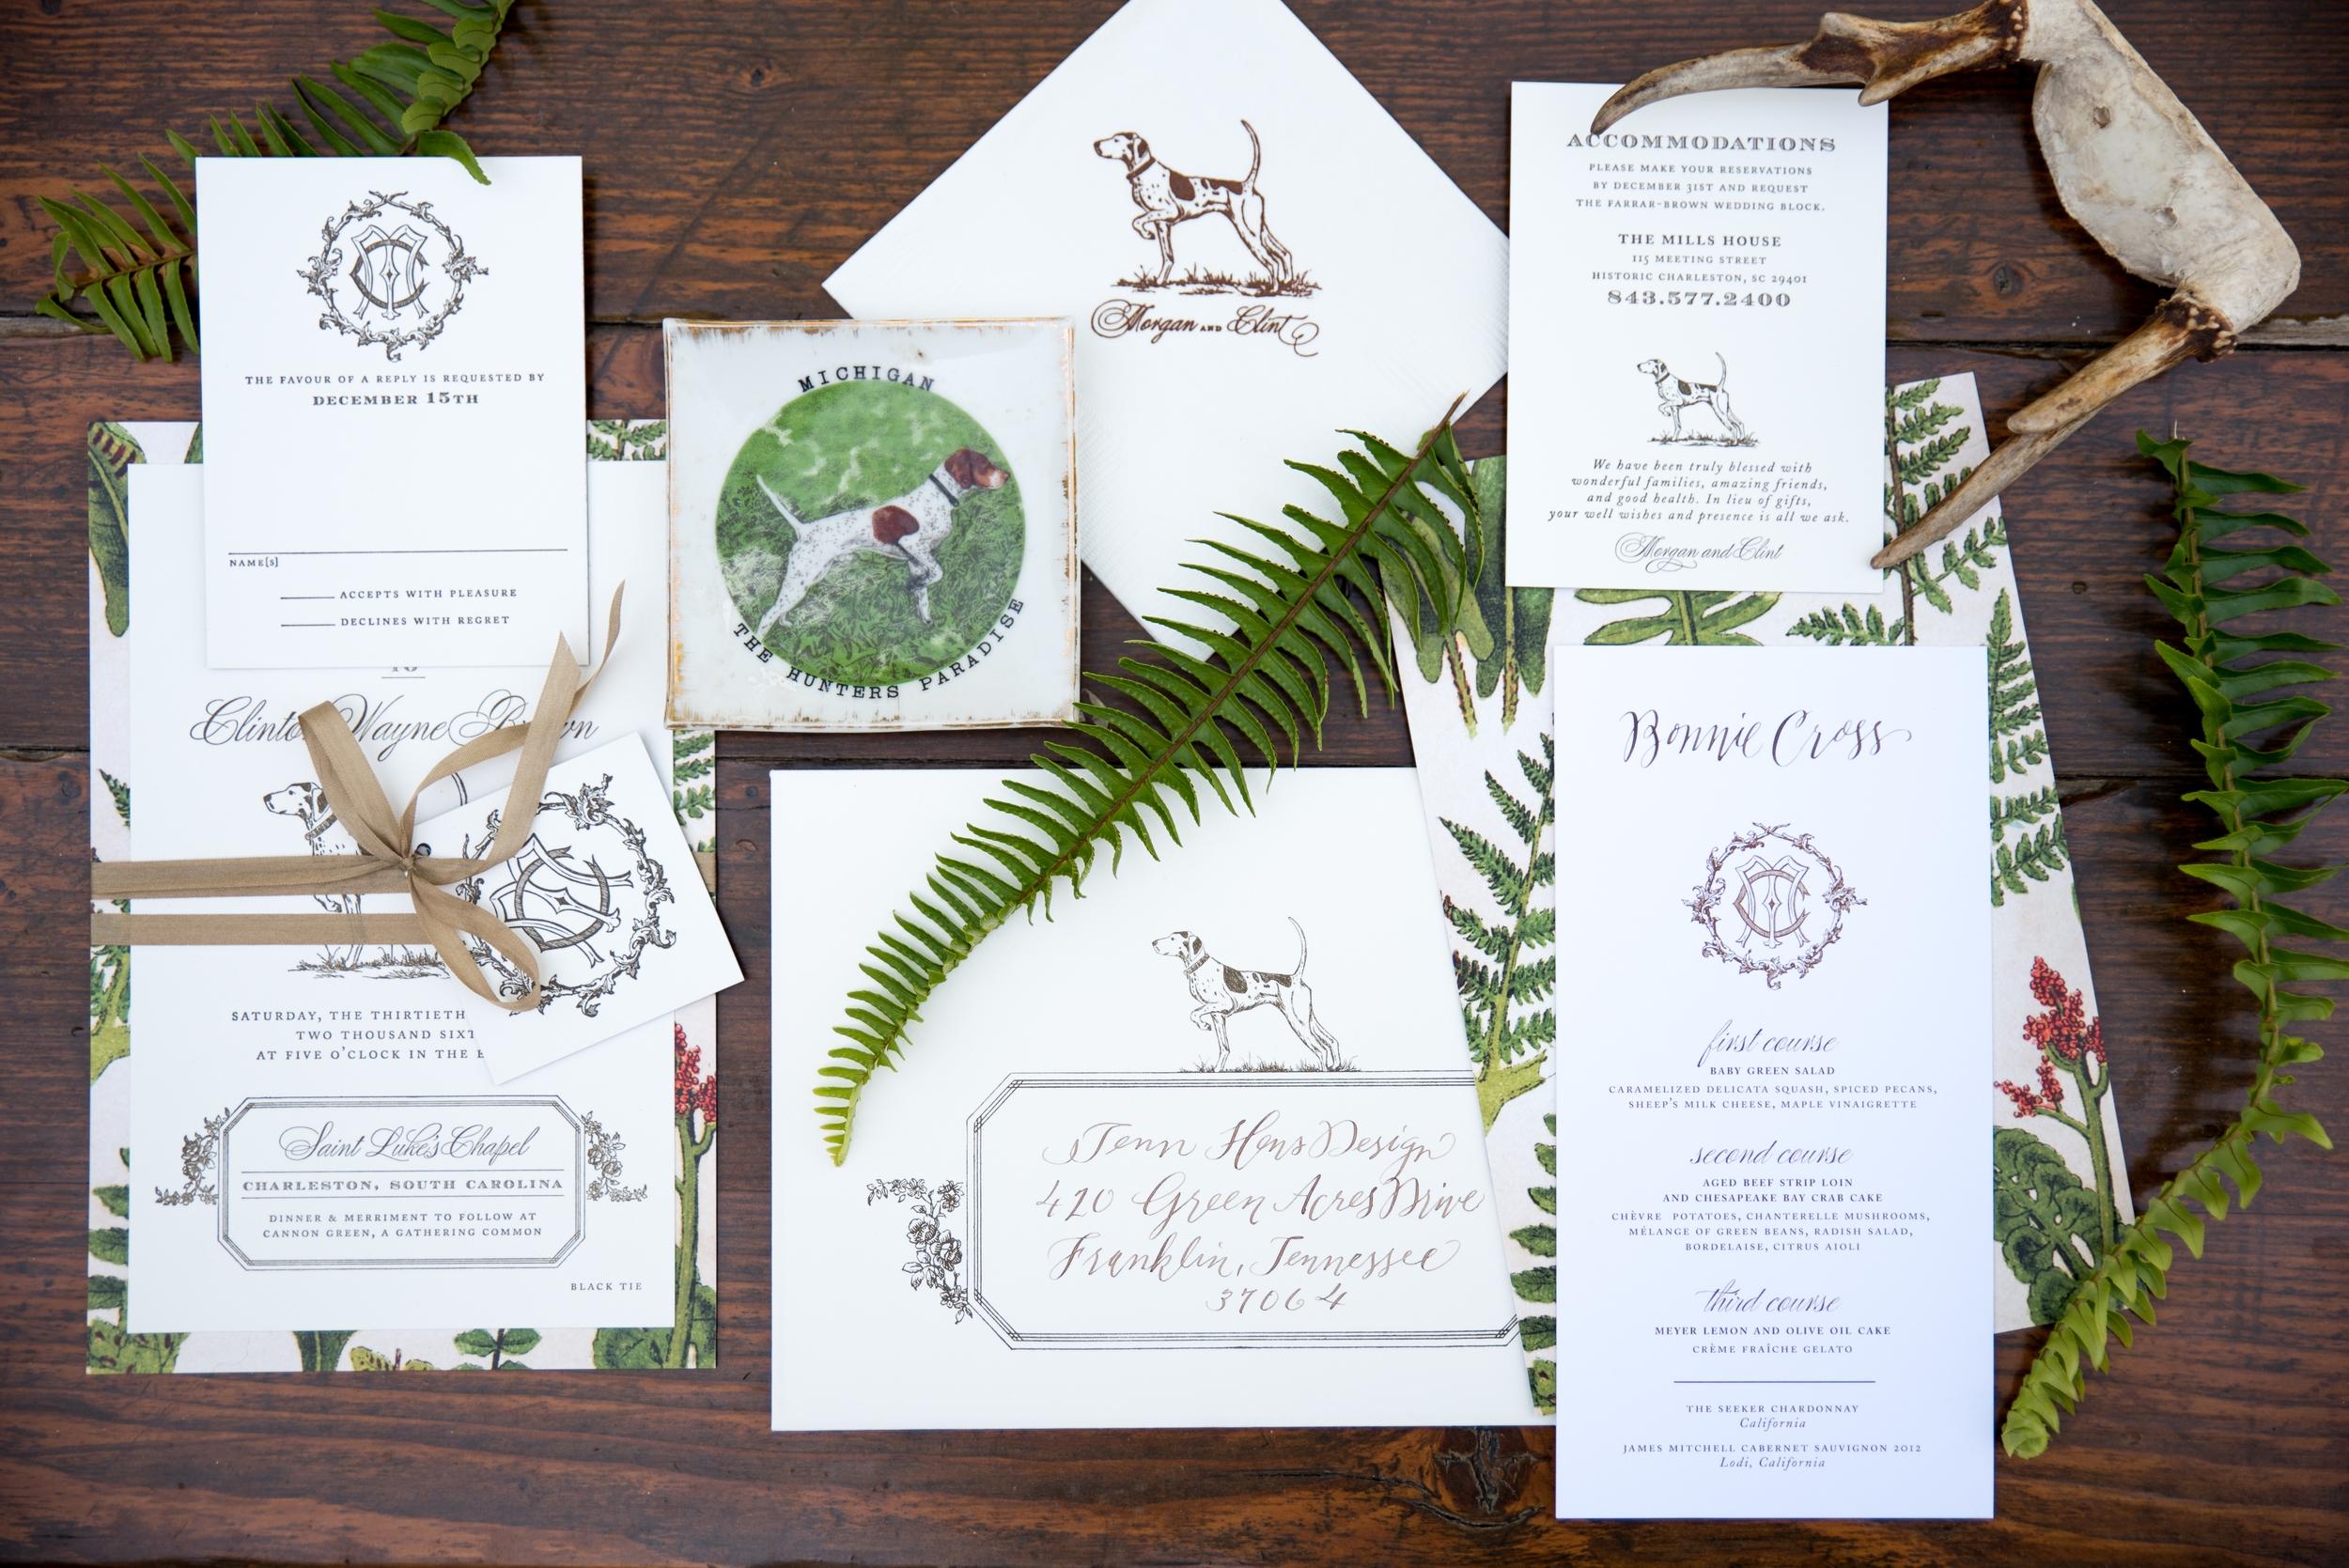 pointer dog wedding suite letterpress stationery